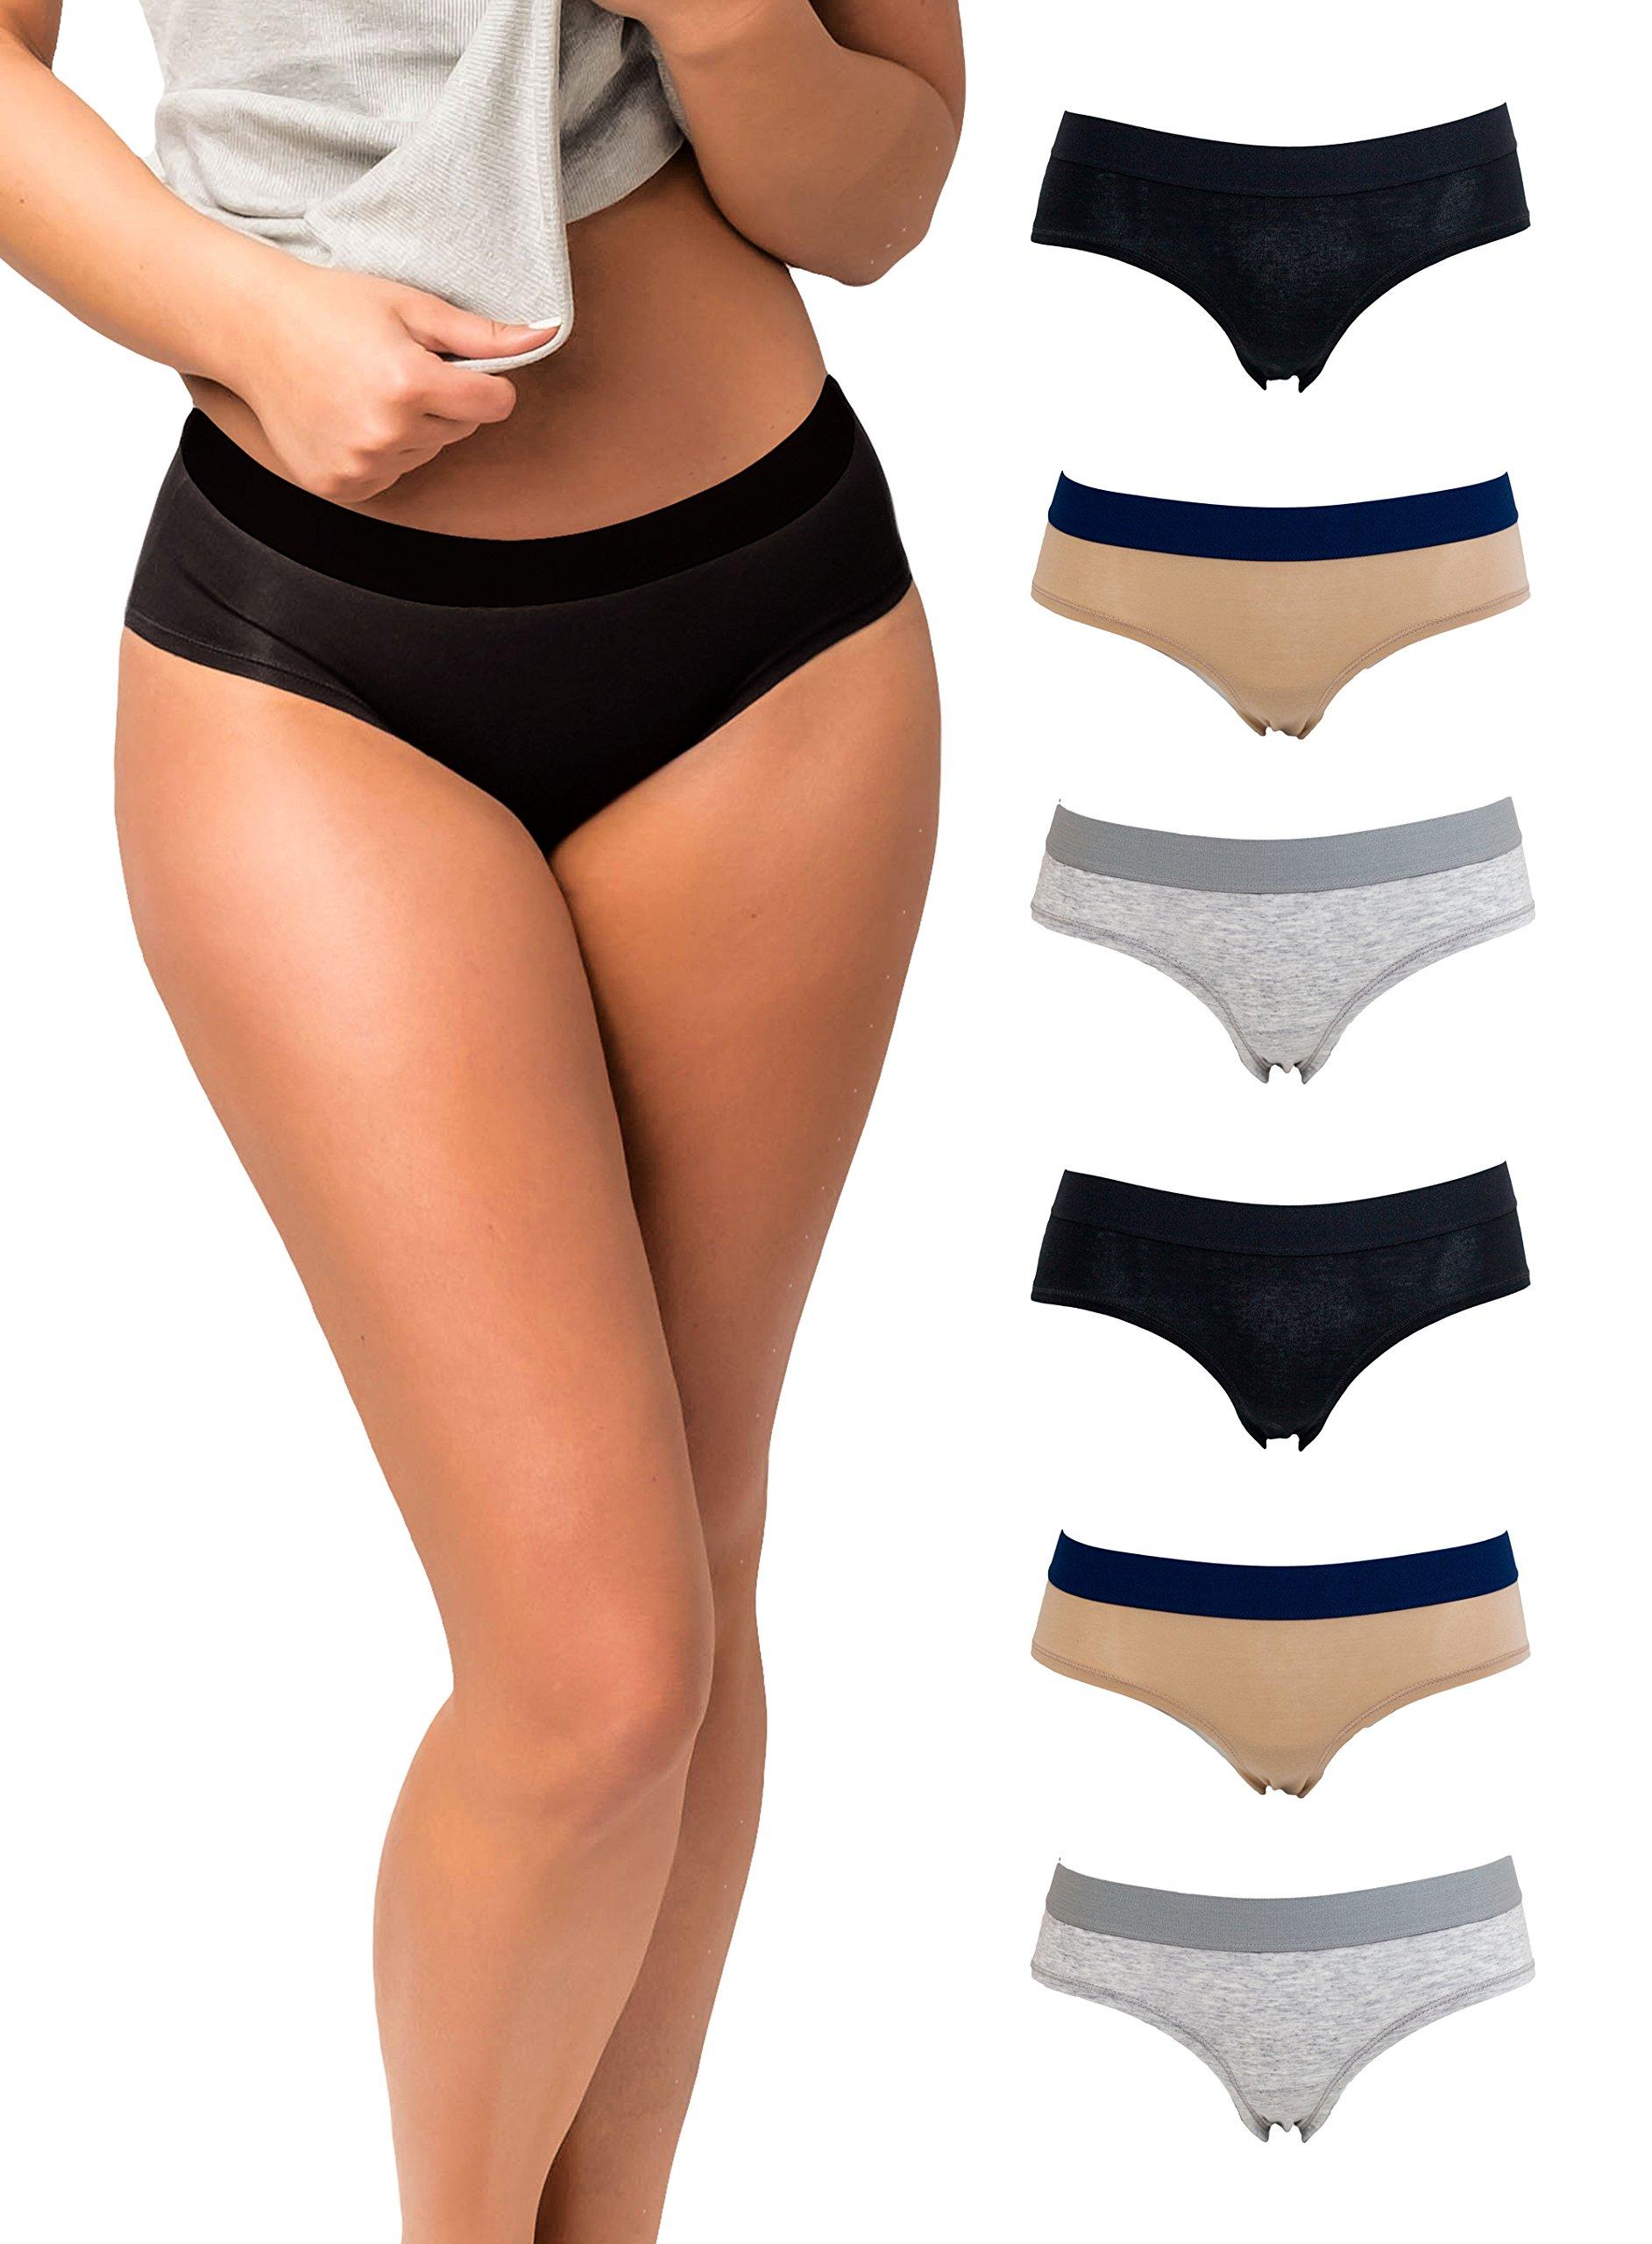 14a5f201b42f Emprella Womens Underwear Cotton, Women 6 Pack Hipster Ladies Panties, Size  S-XL Panty